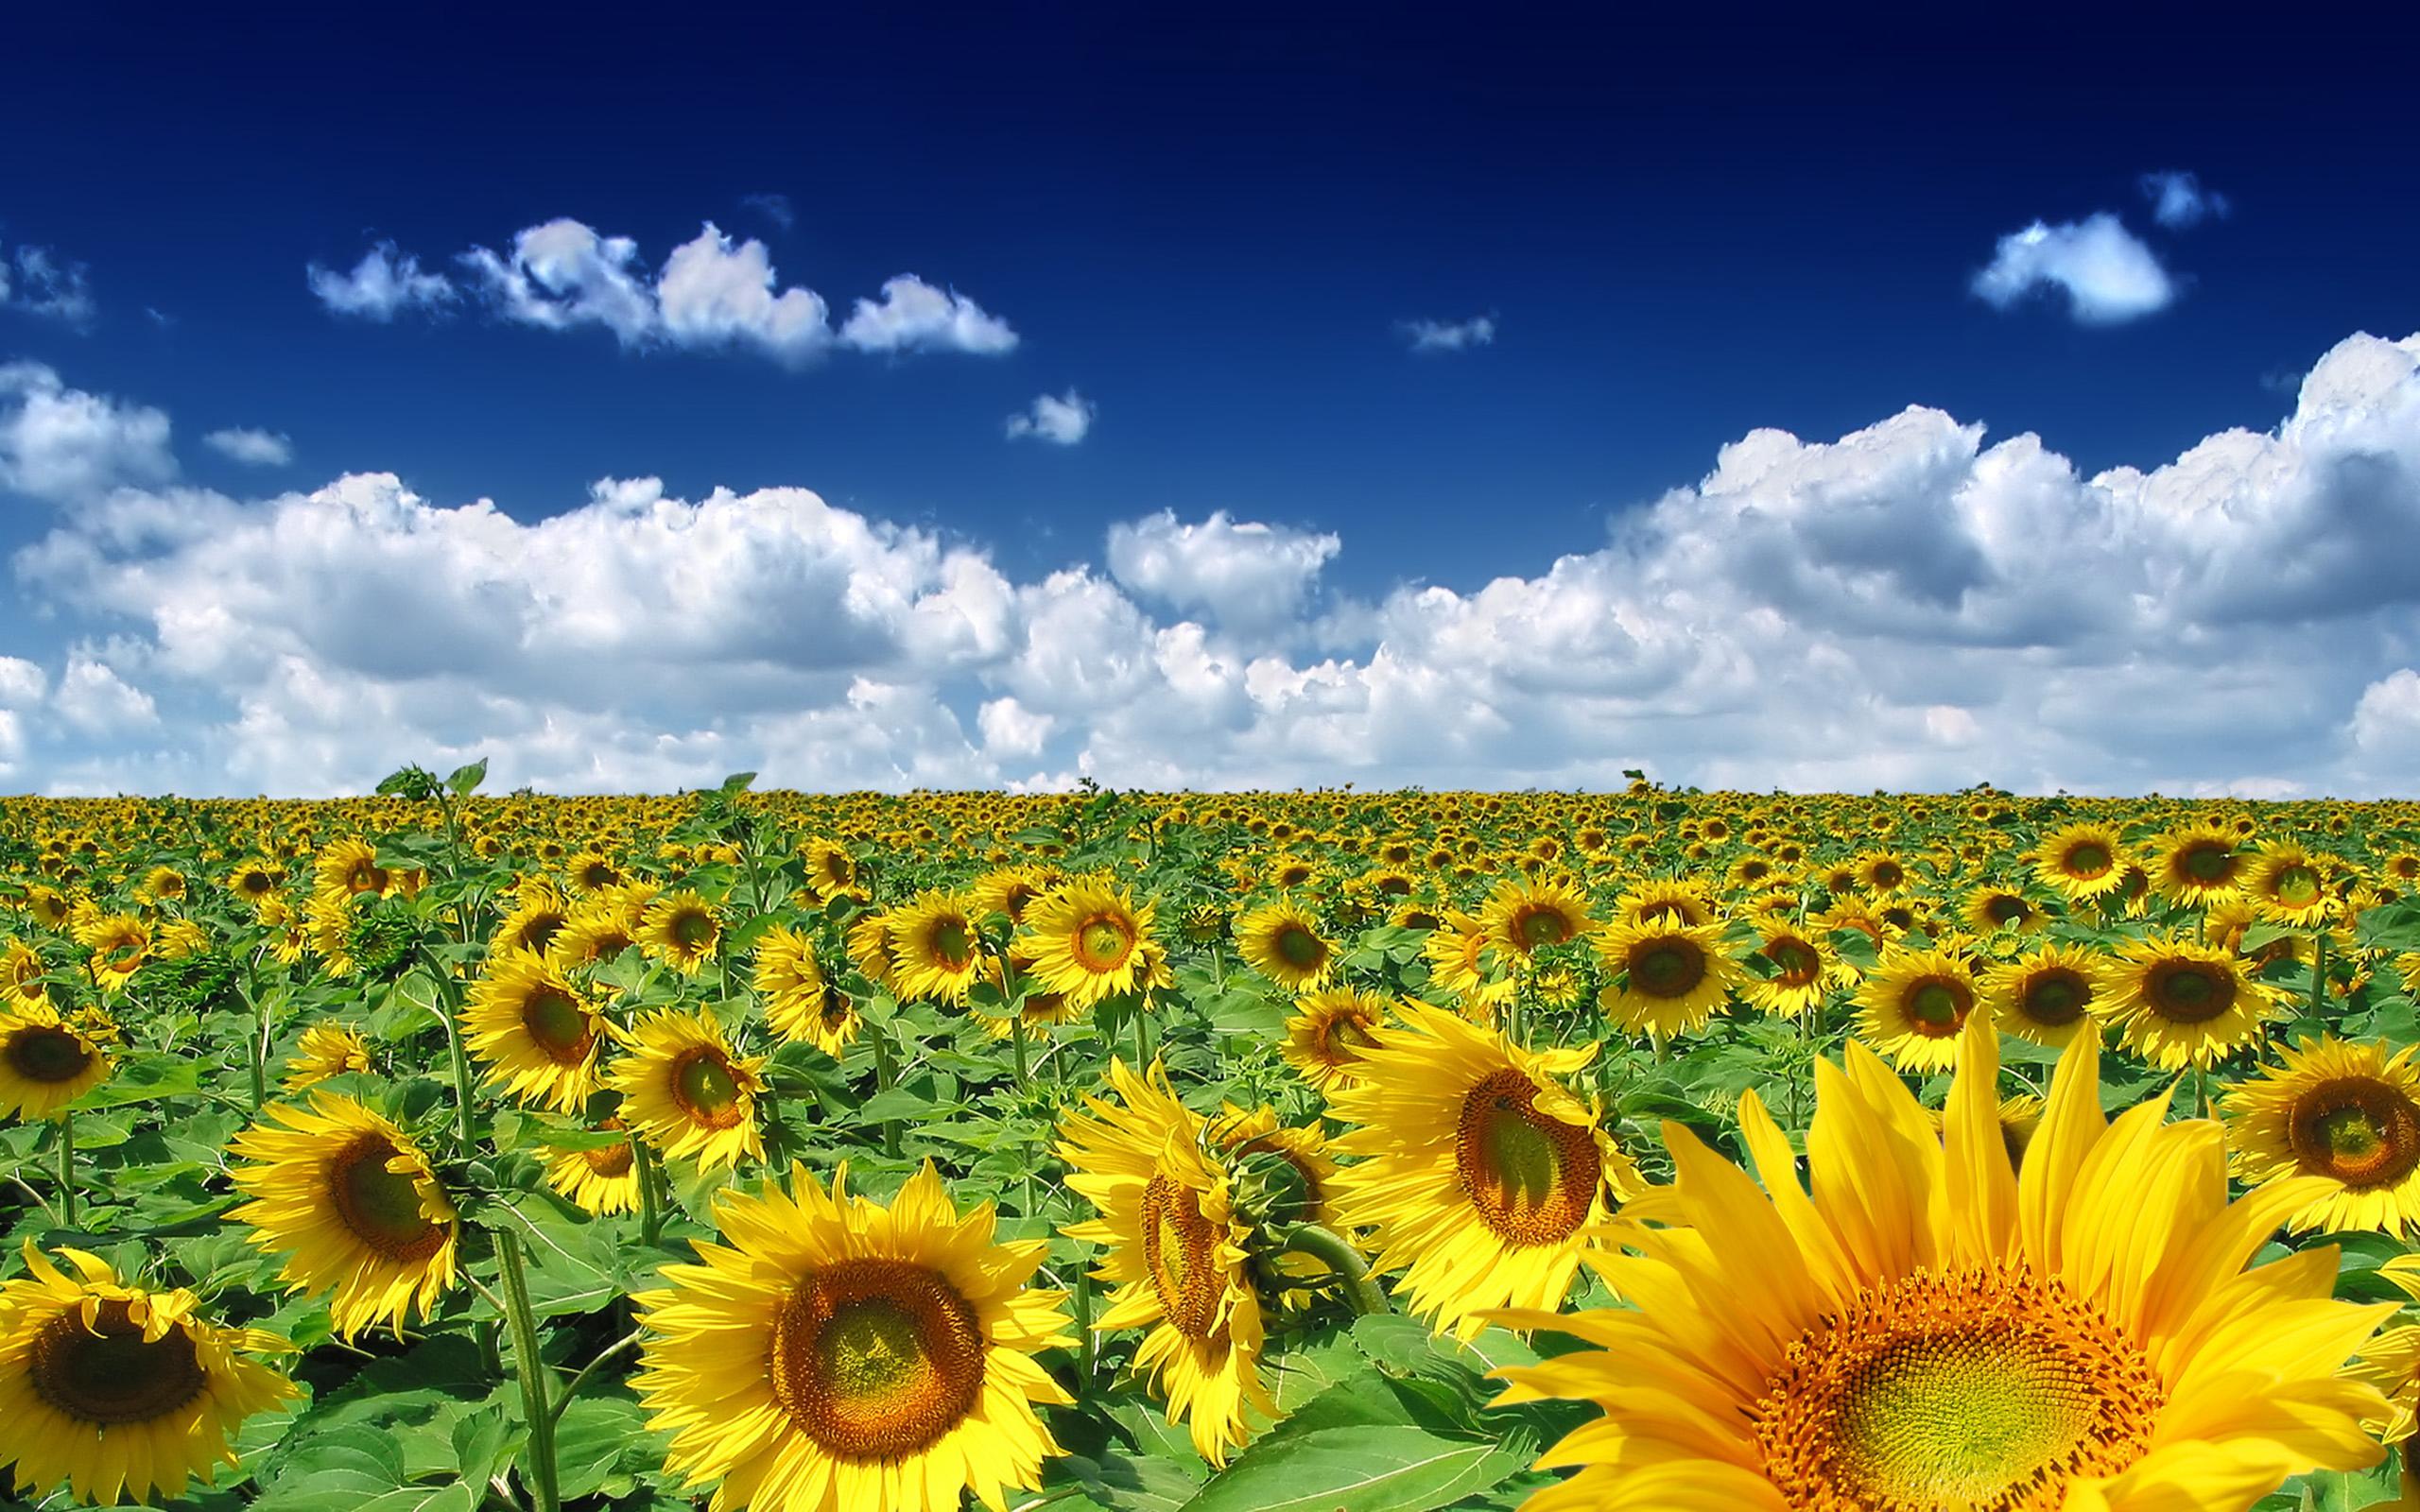 Sunflowers Summer Field Nature